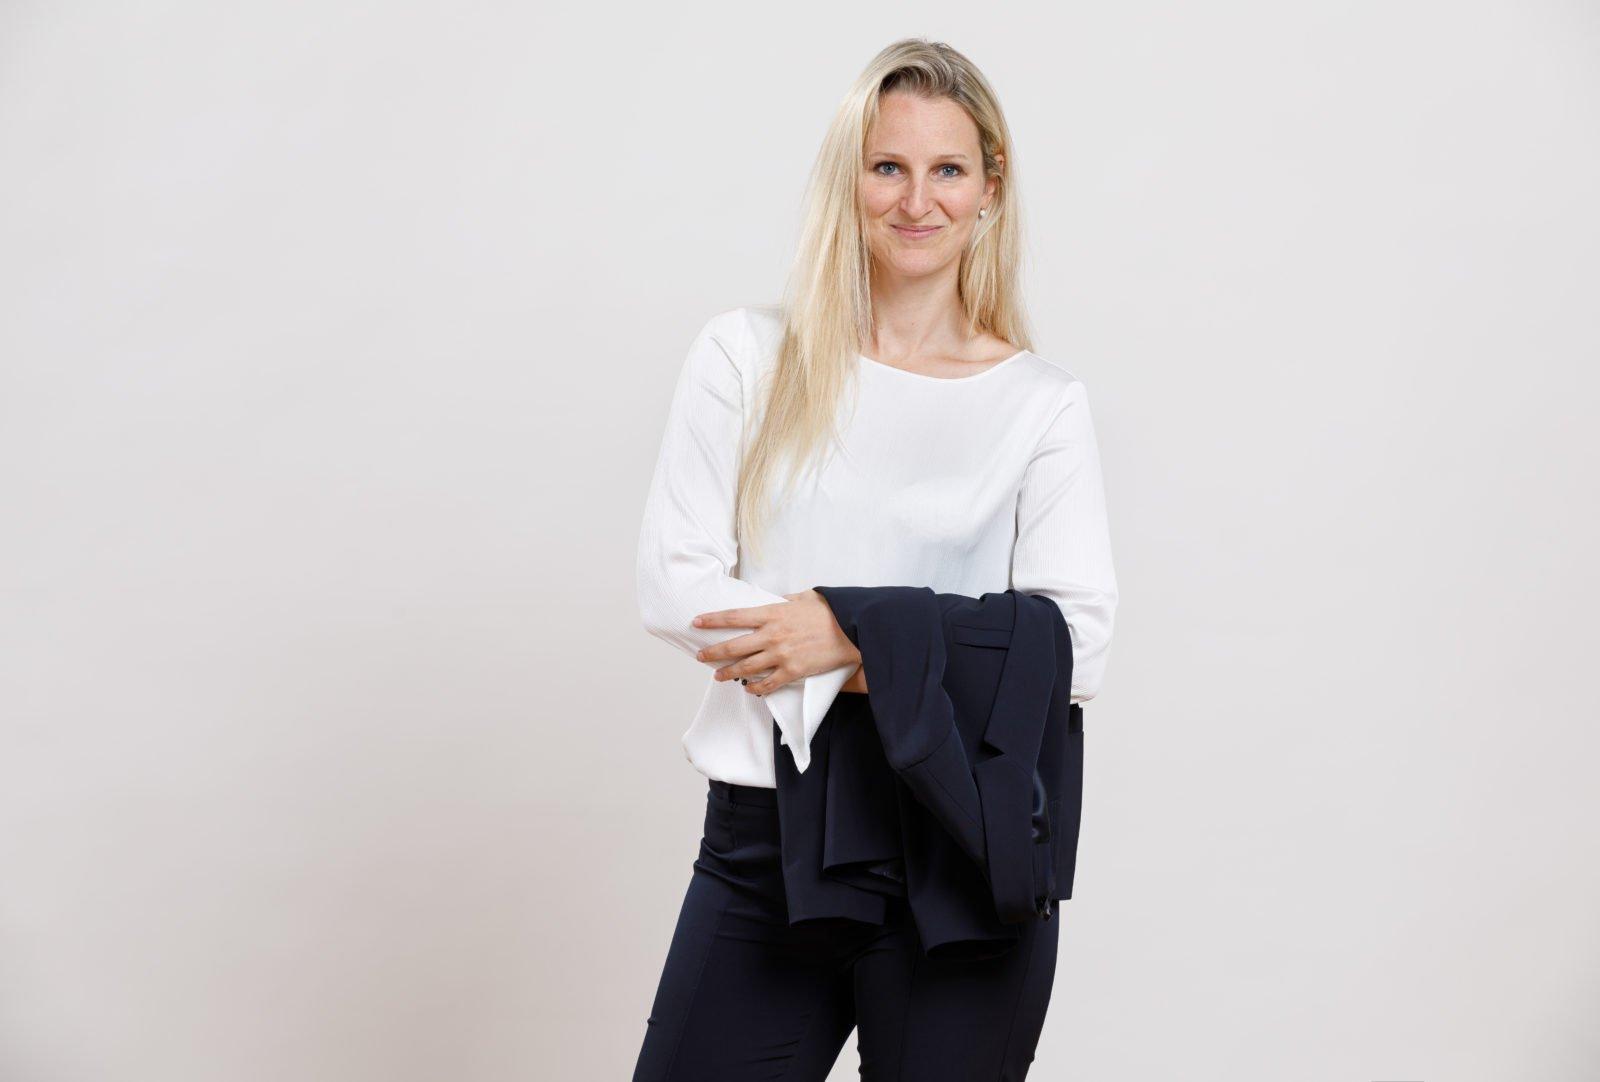 Sonja Millgrammer